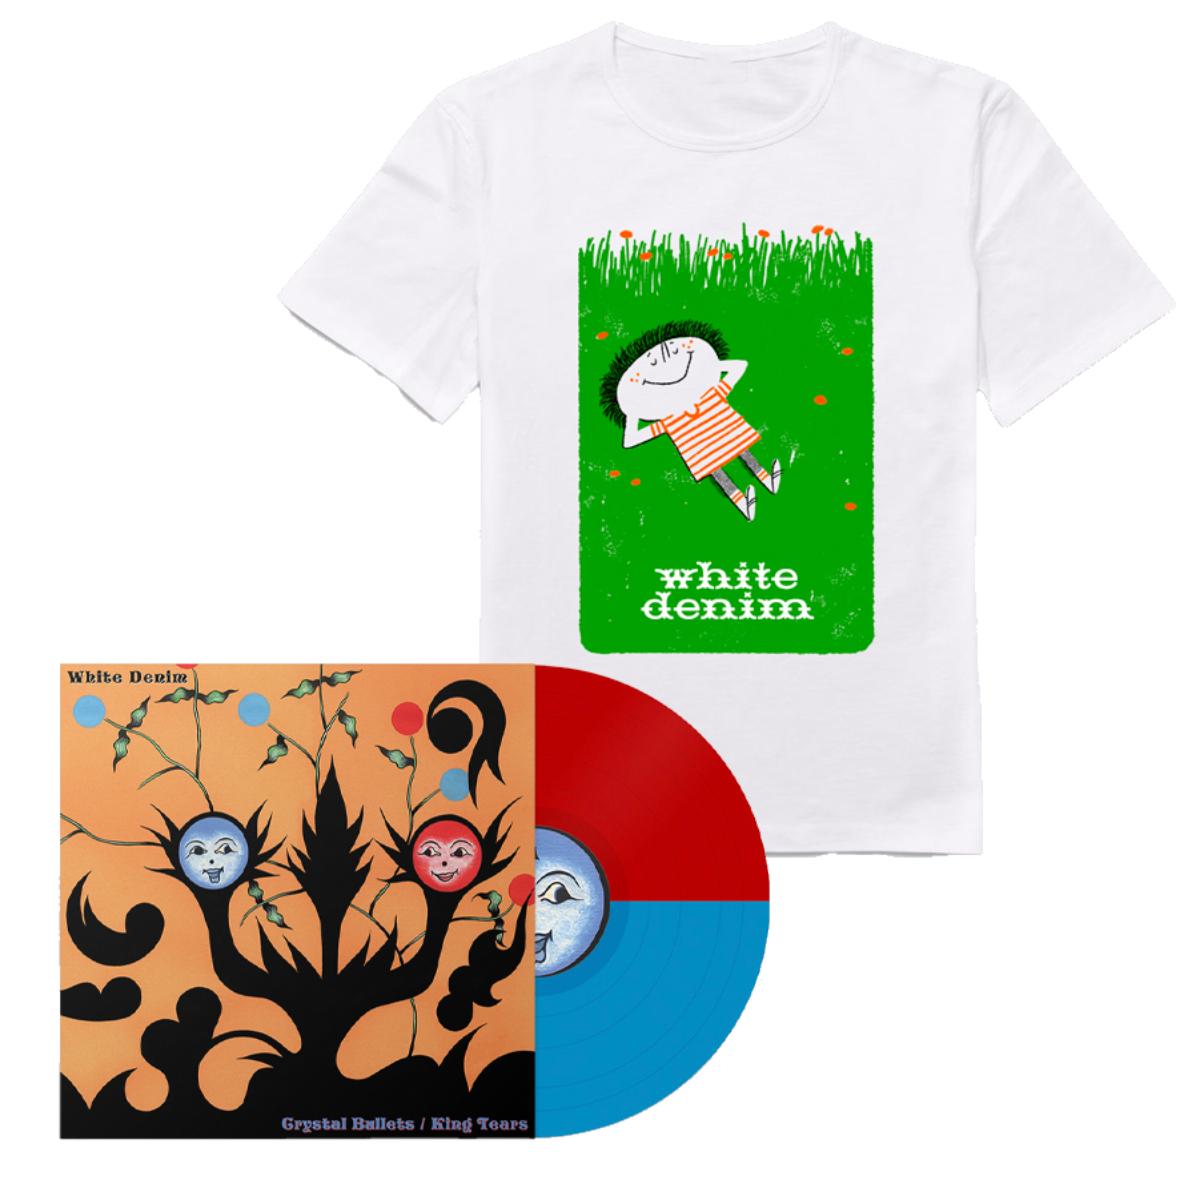 Crystal Bullets B/W King Tears + Grass T-Shirt Bundle